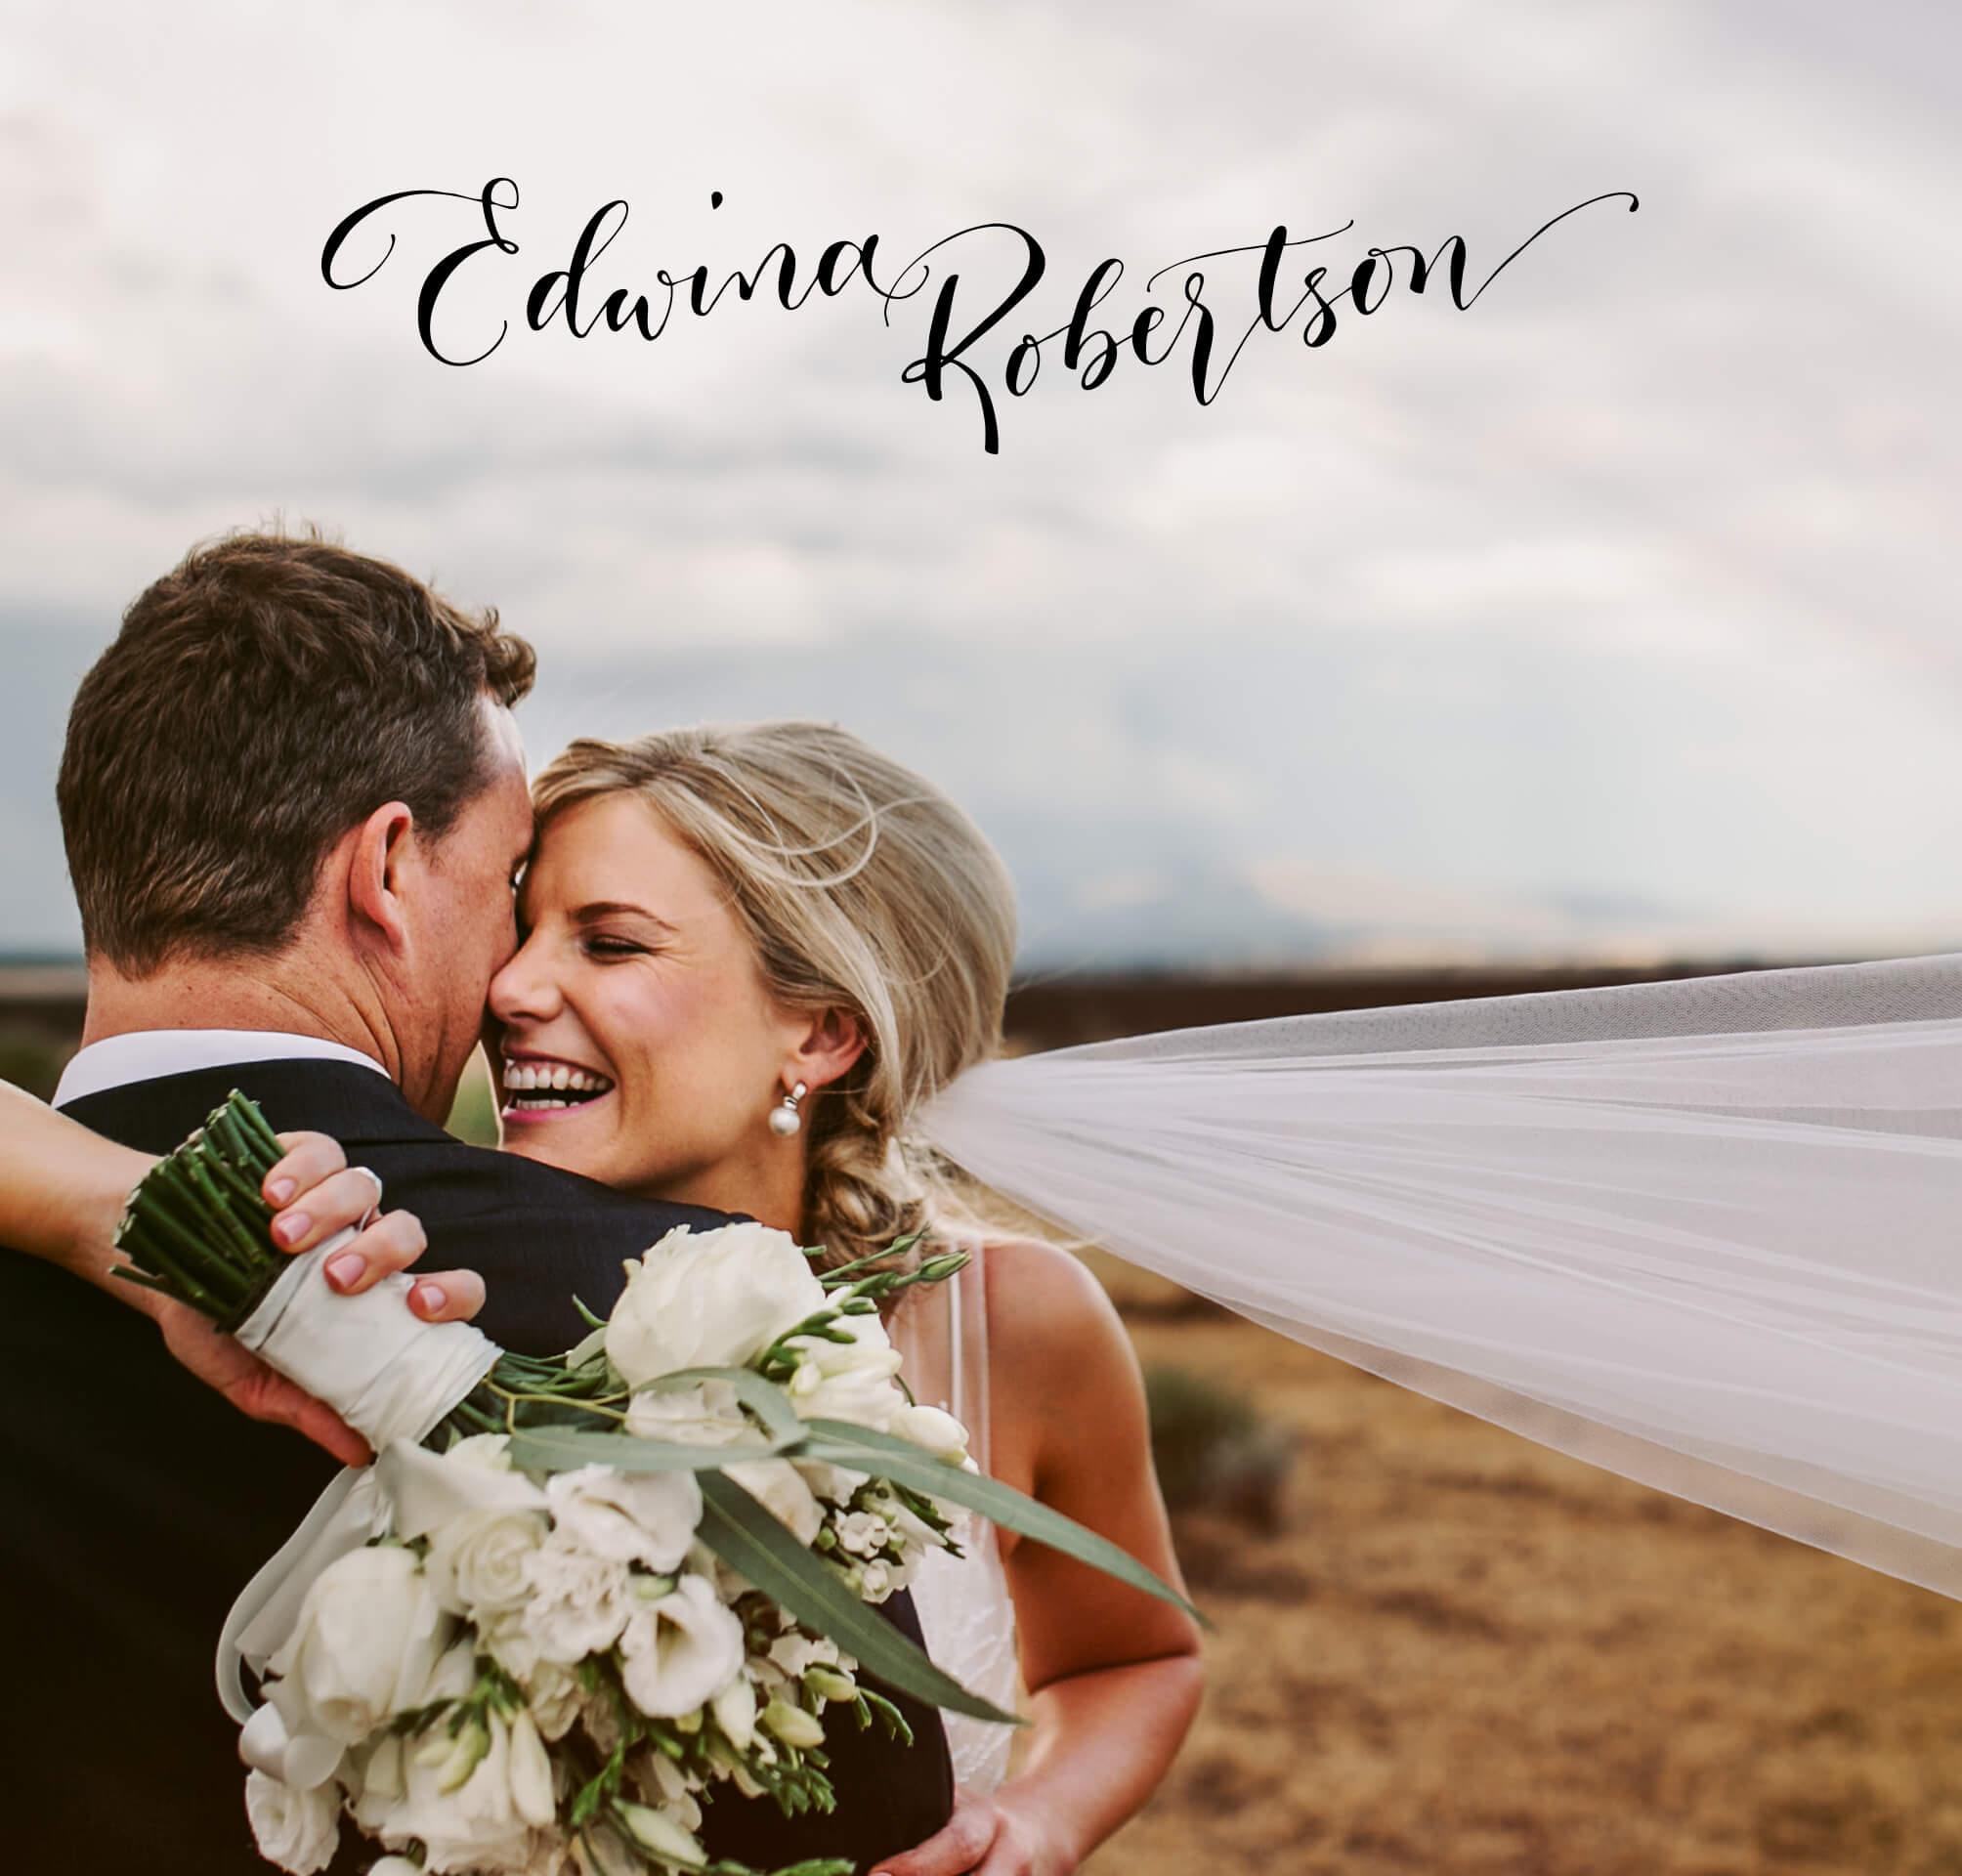 australia-photographer-edwina-robertson-logo.jpg